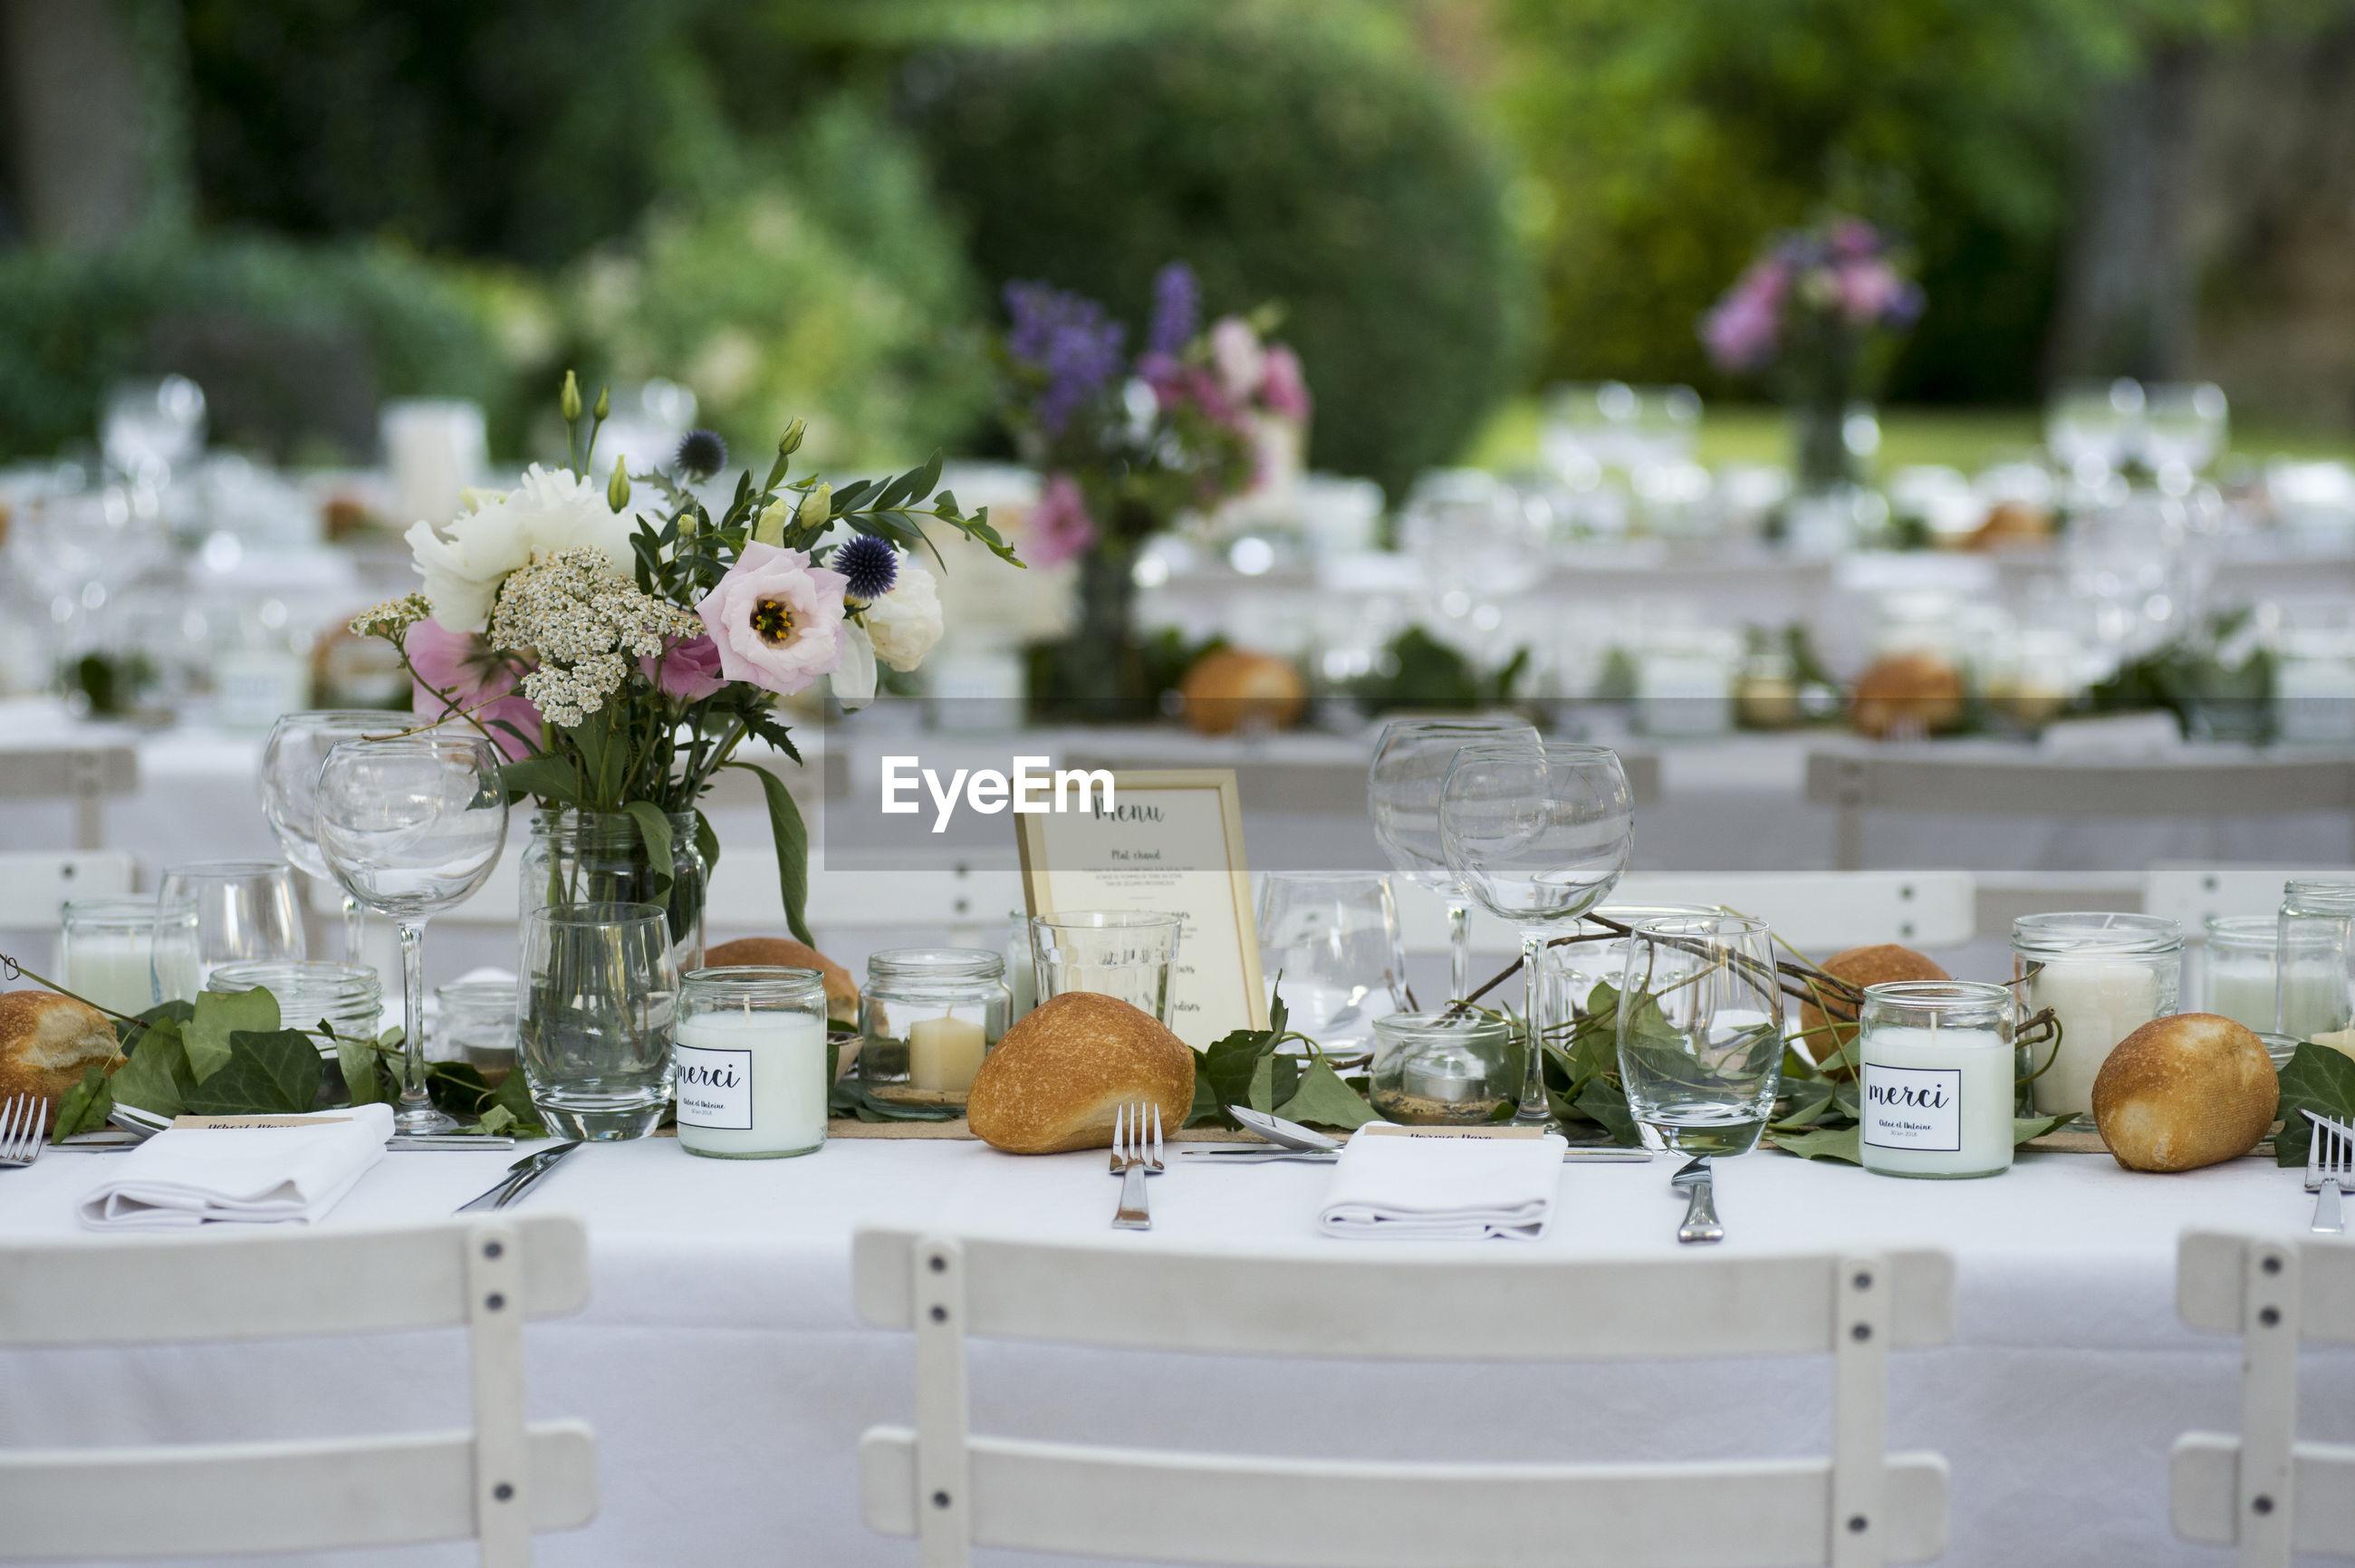 FLOWERS IN VASE ON TABLE AGAINST PLANTS